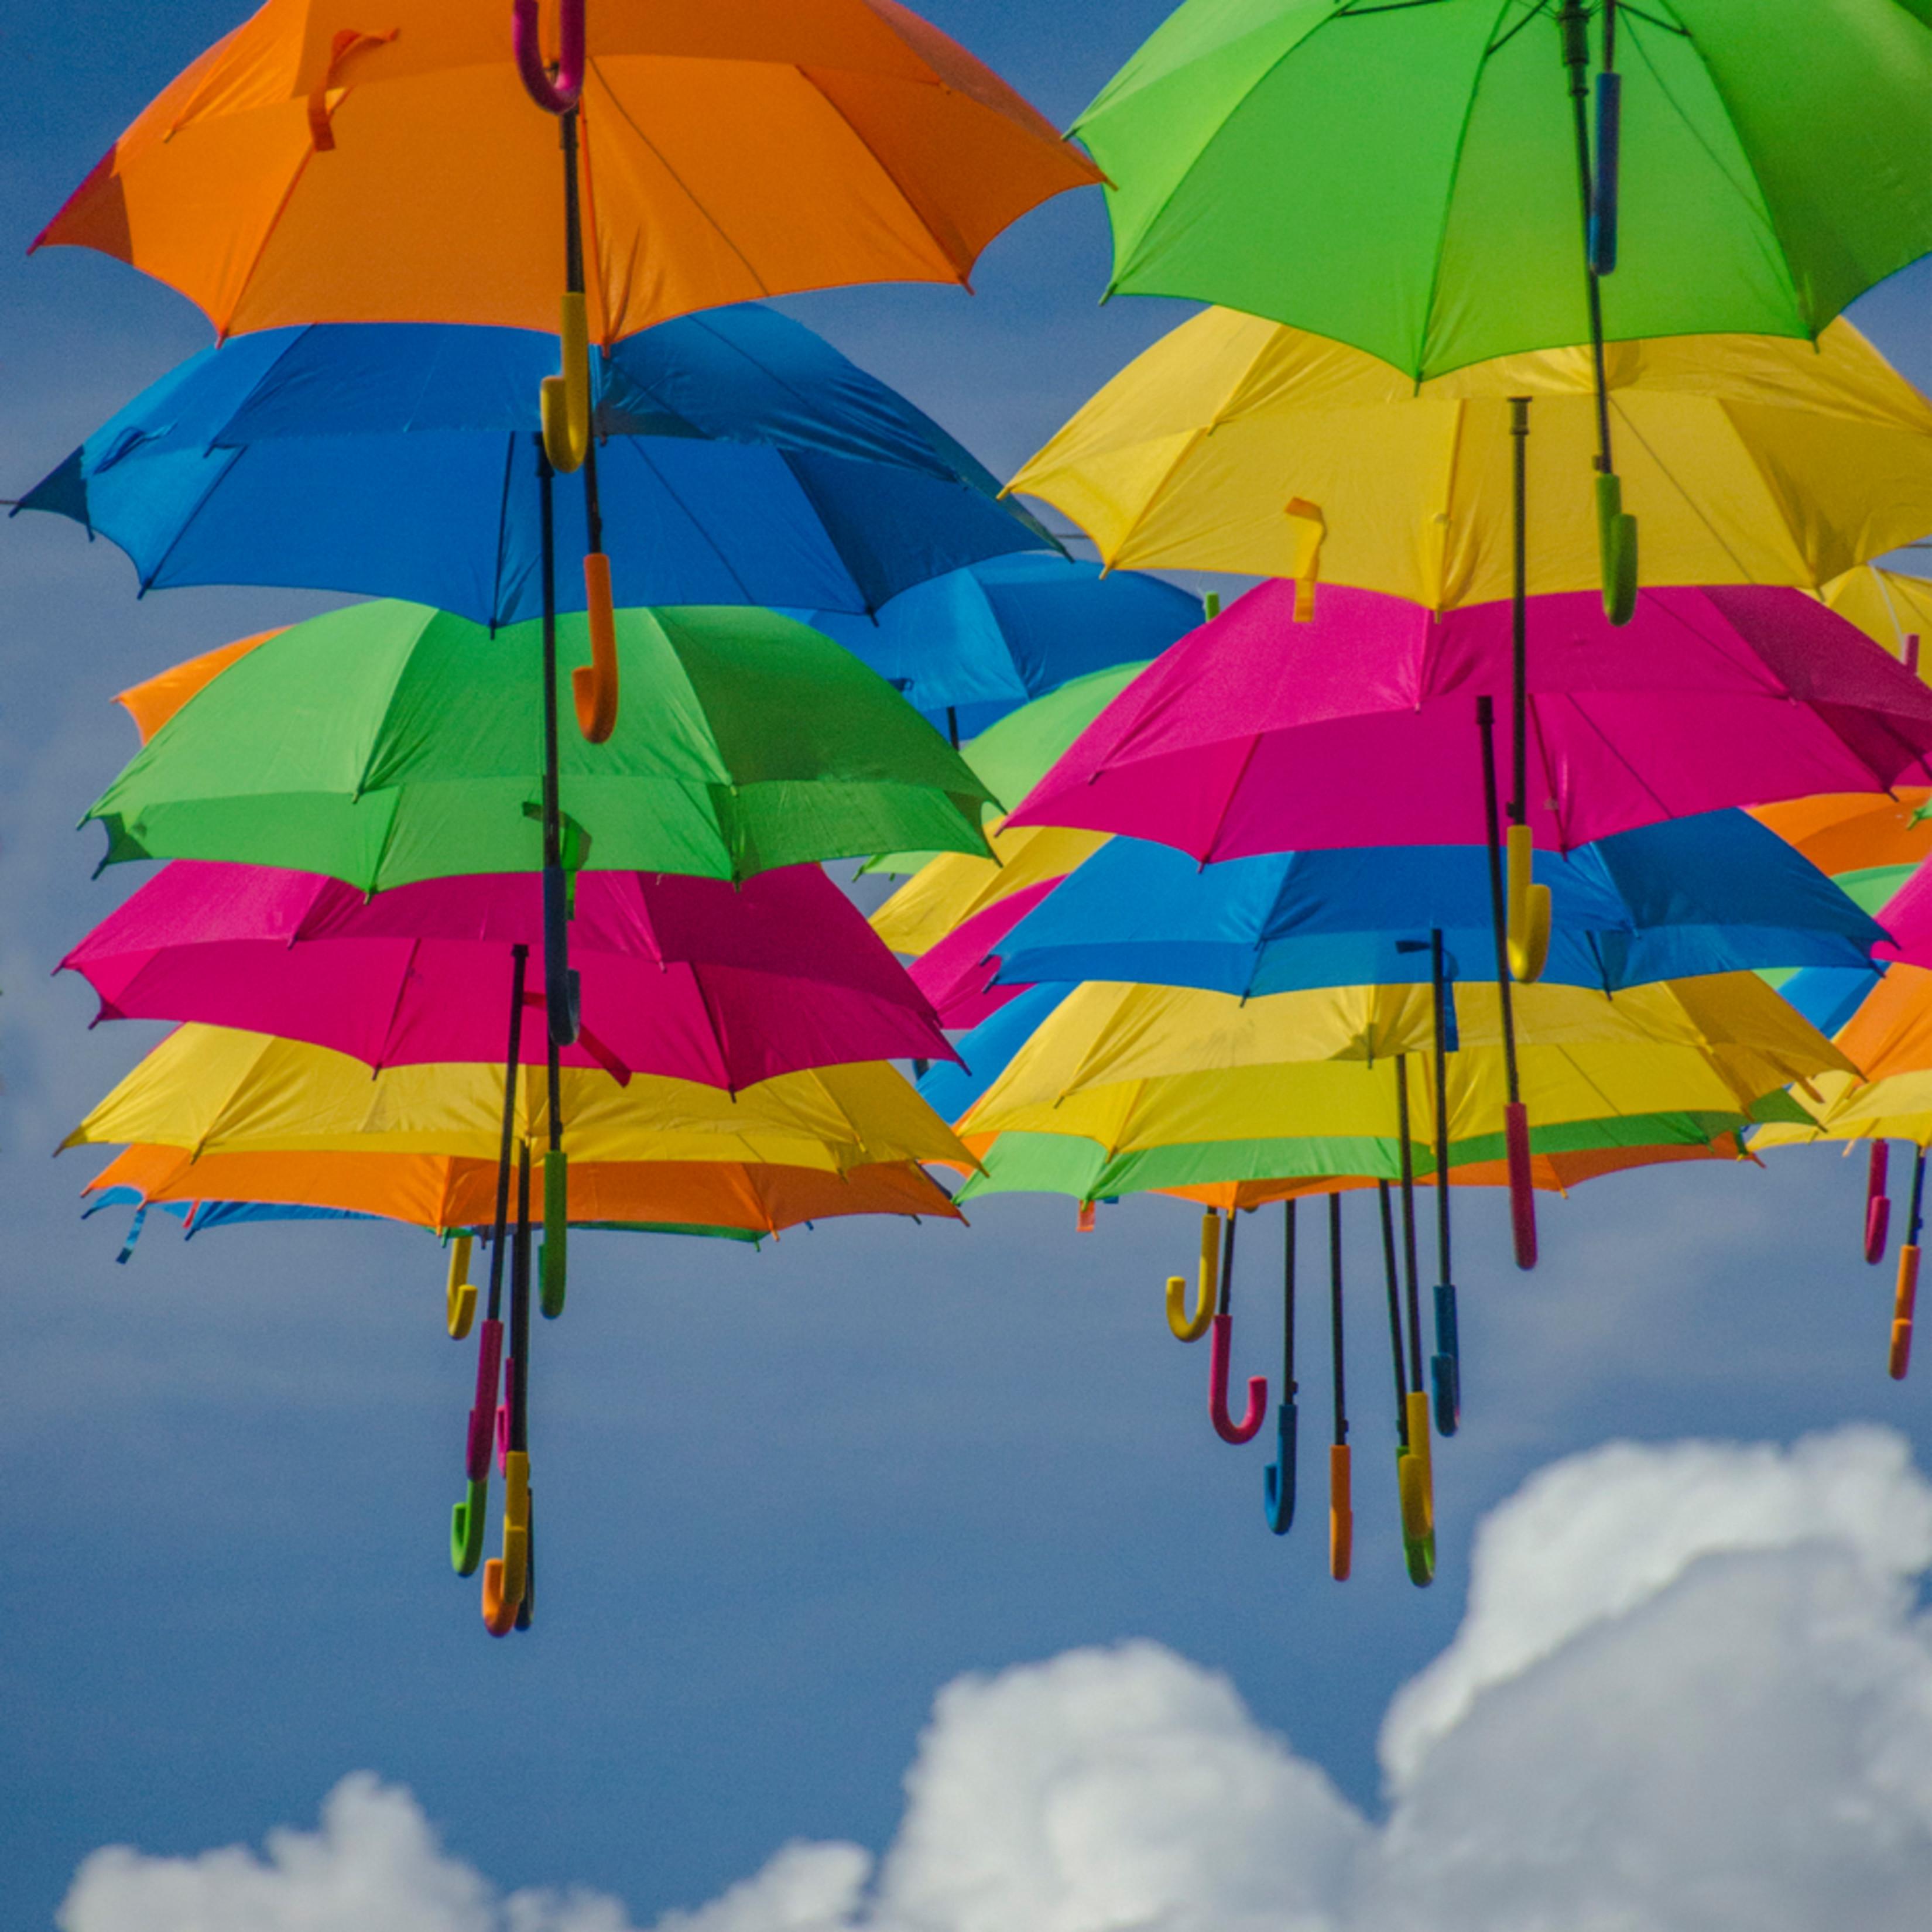 No rain on my parade wjraz9